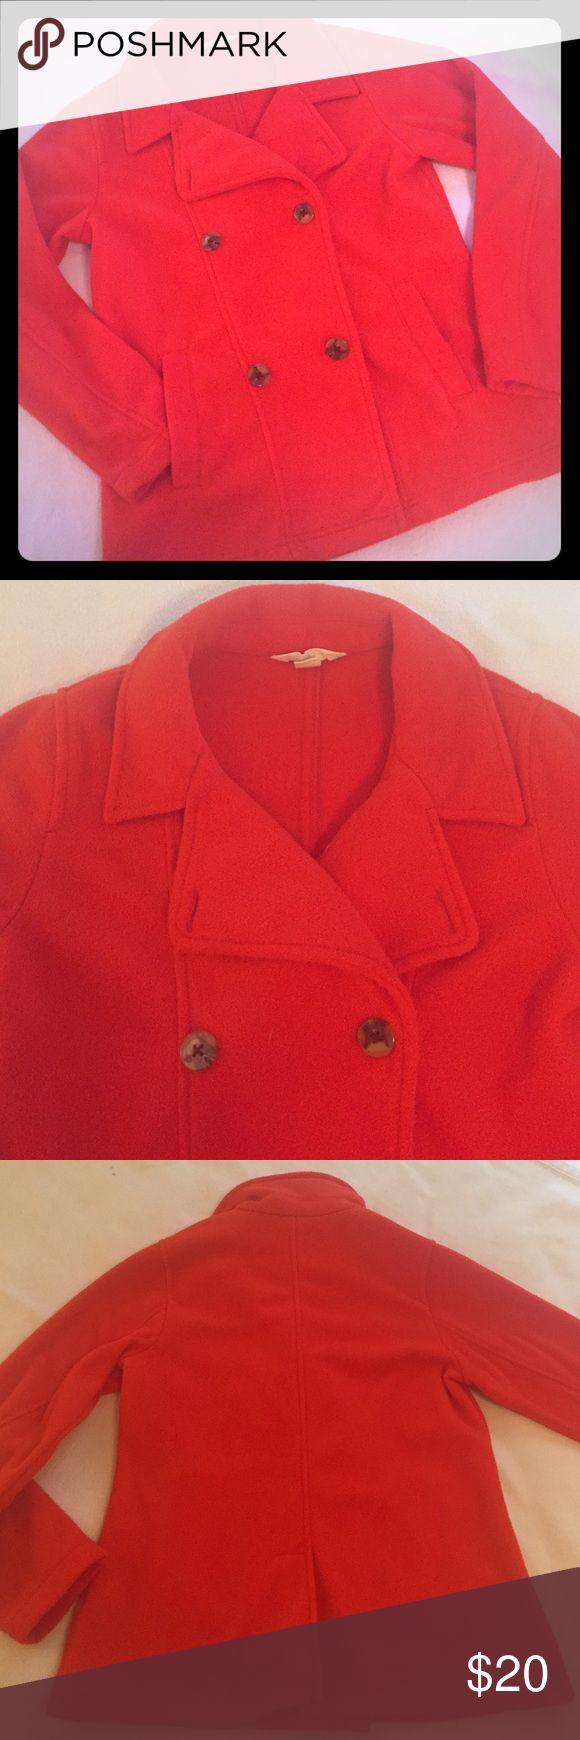 Lands End Kids fleece pea coat Lands End Kids cherry red fleece pea coat. Lands' End Jackets & Coats Pea Coats